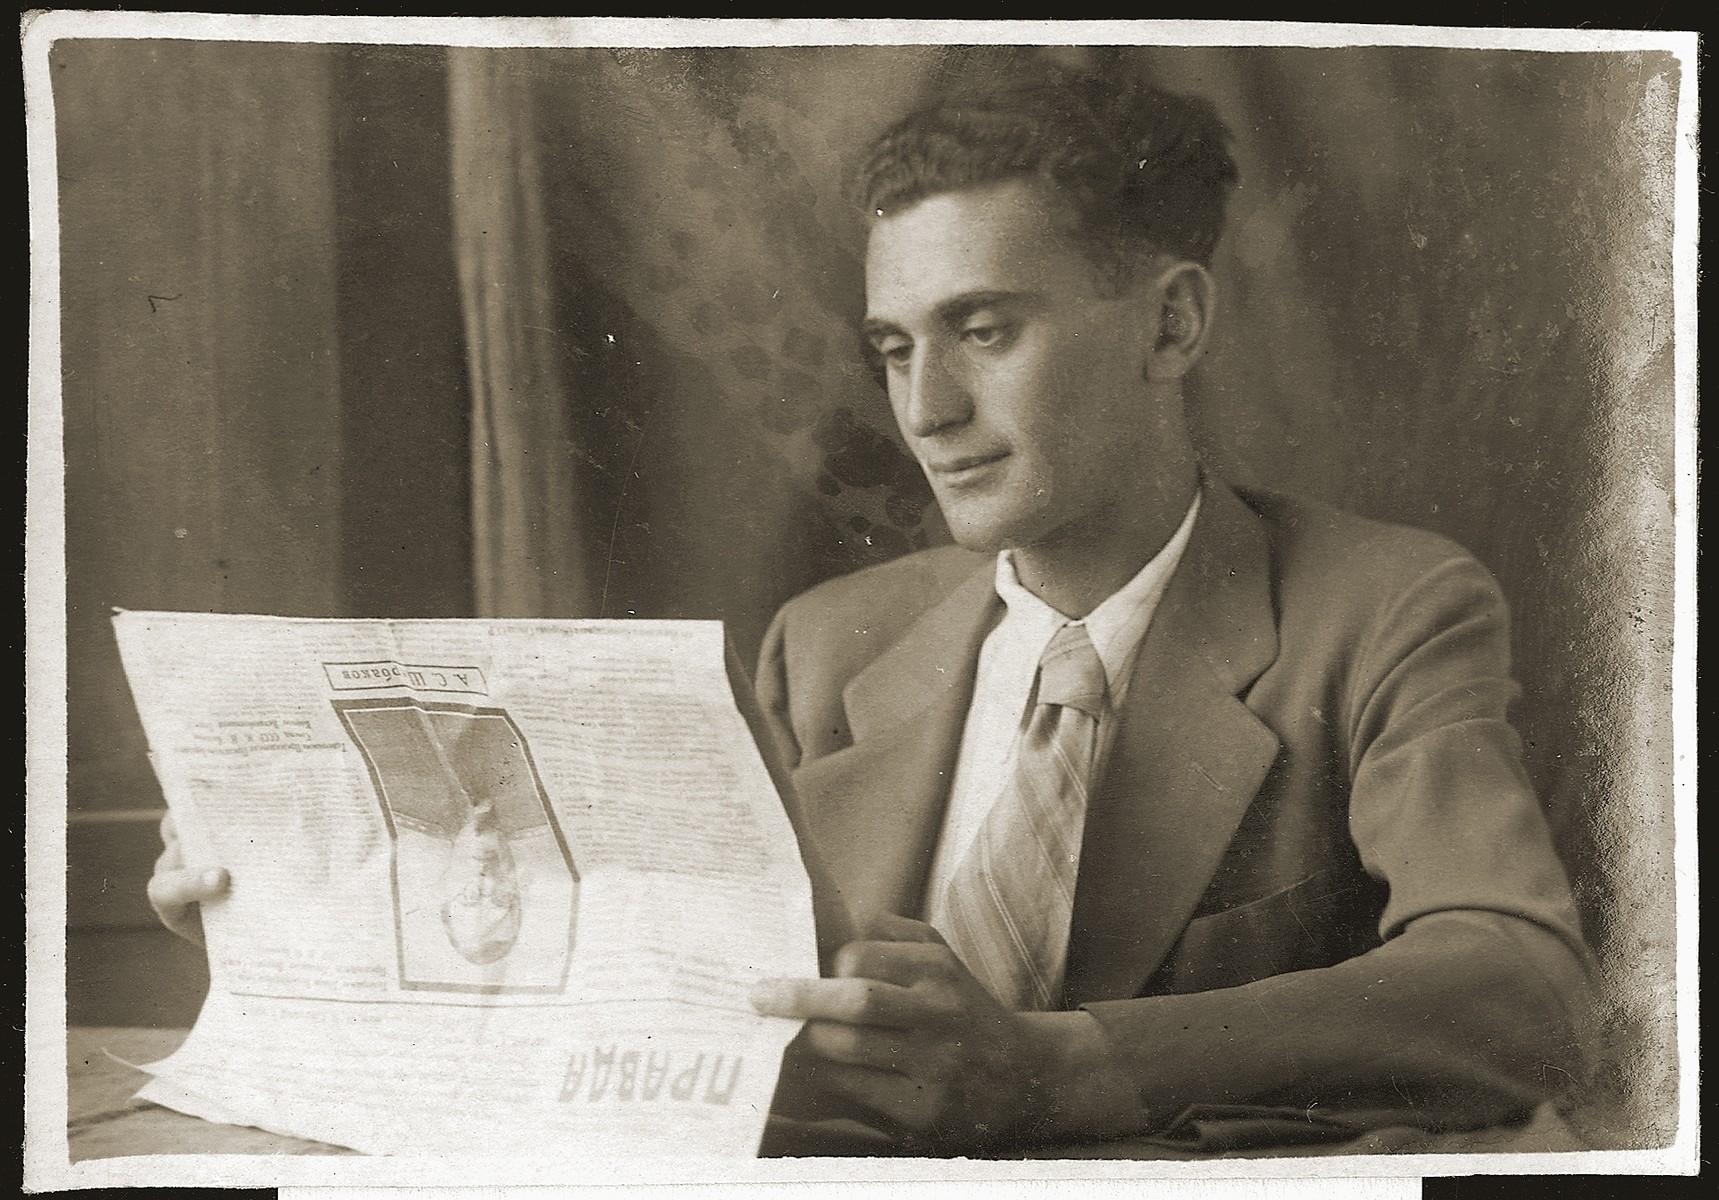 Salek Liwer reading the Russian newspaper, Pravda, in his room in Bukhara.